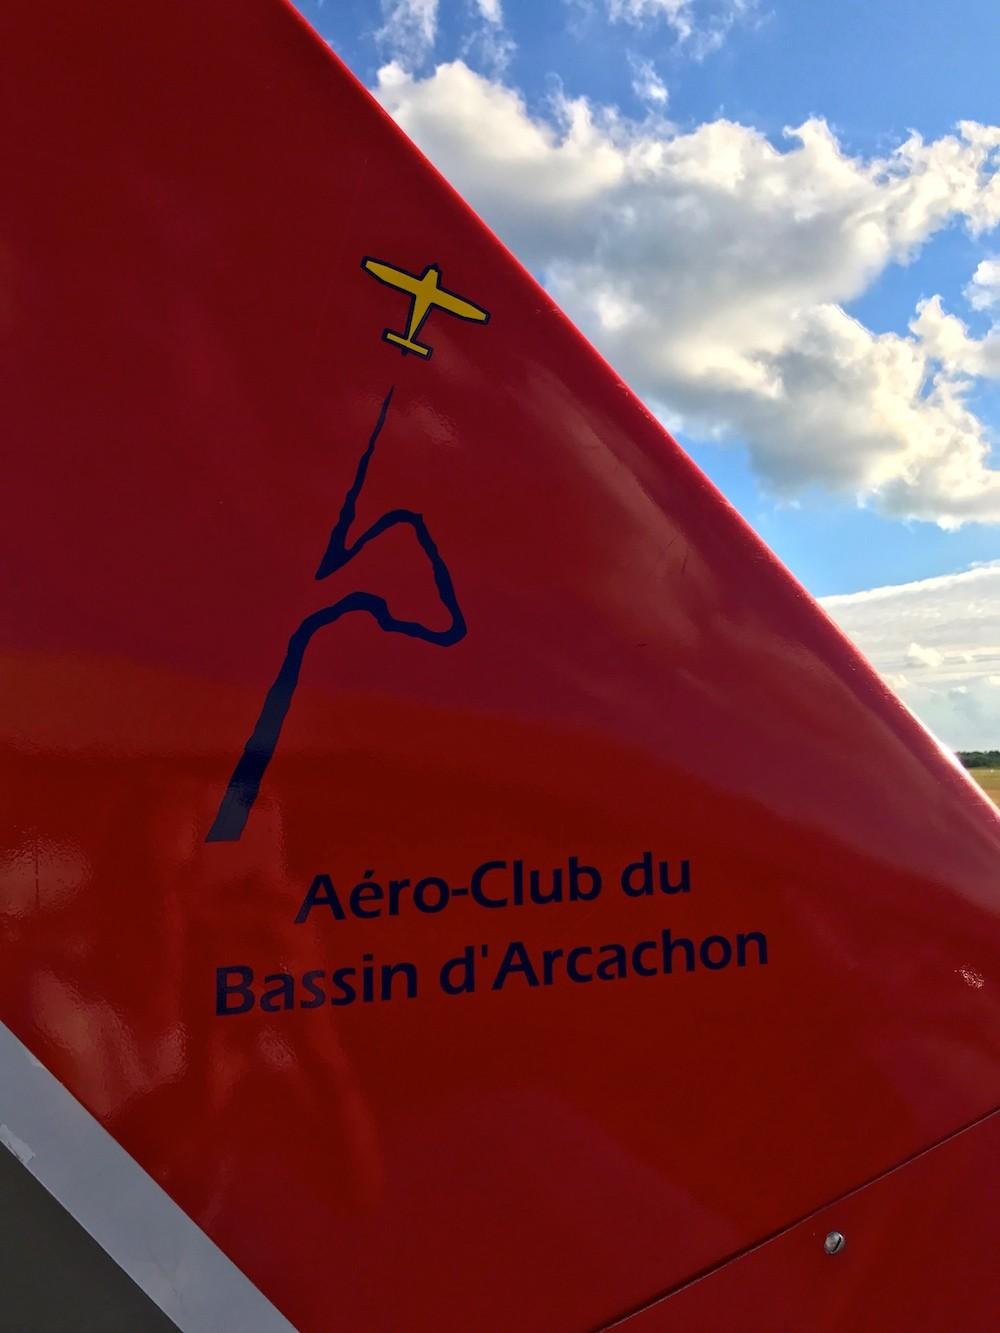 AERO CLUB DU BASSIN D ARCACHON